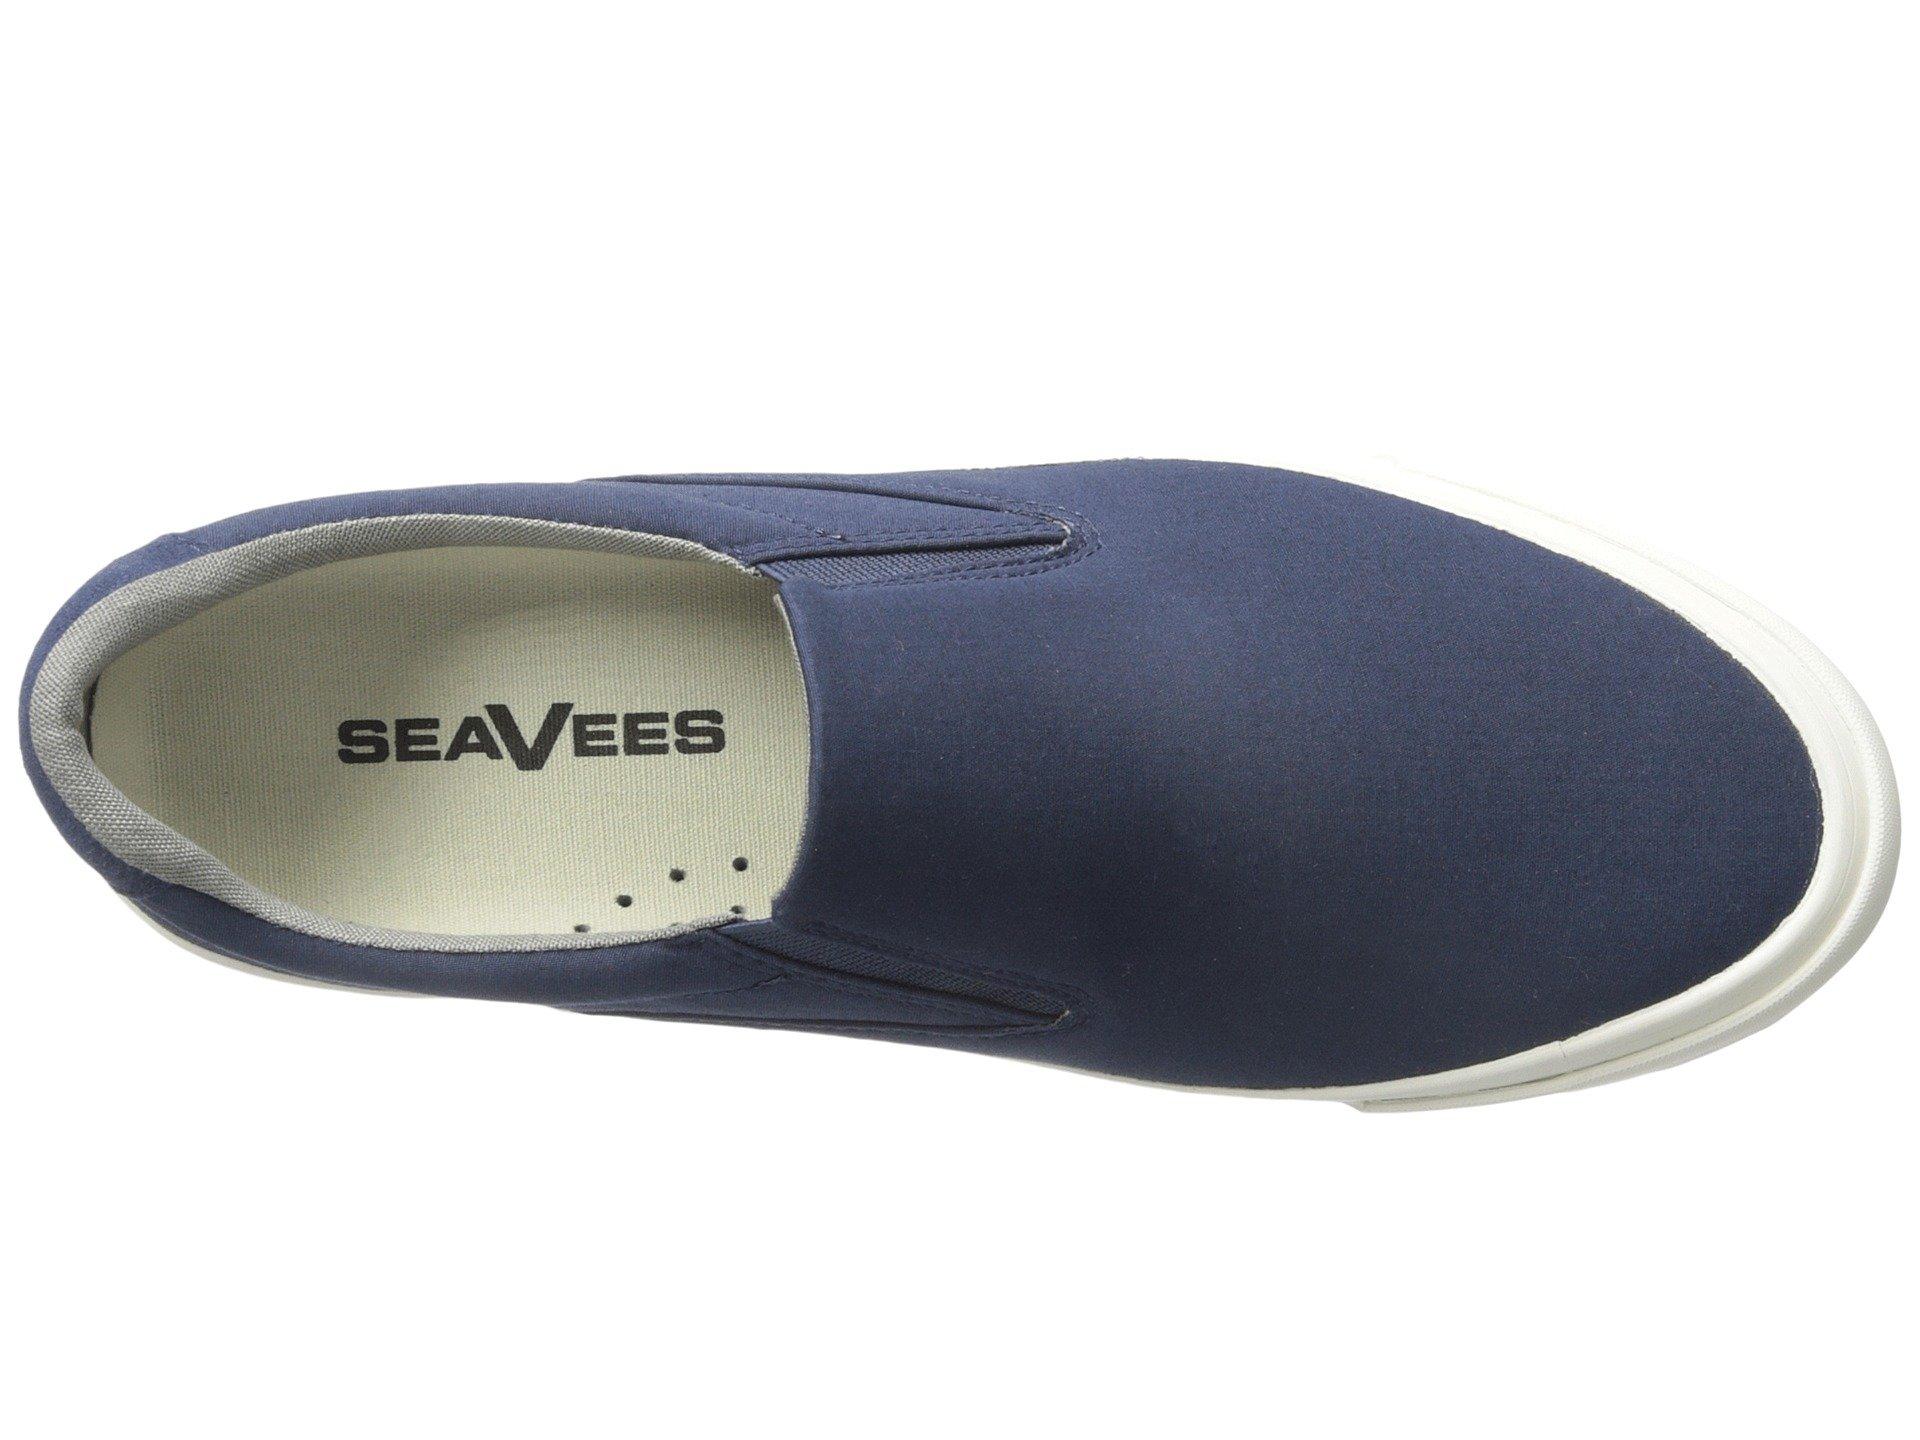 Seavees on Navy Standard Hawthorne 66 True Slip 05 UUgxa8wqR